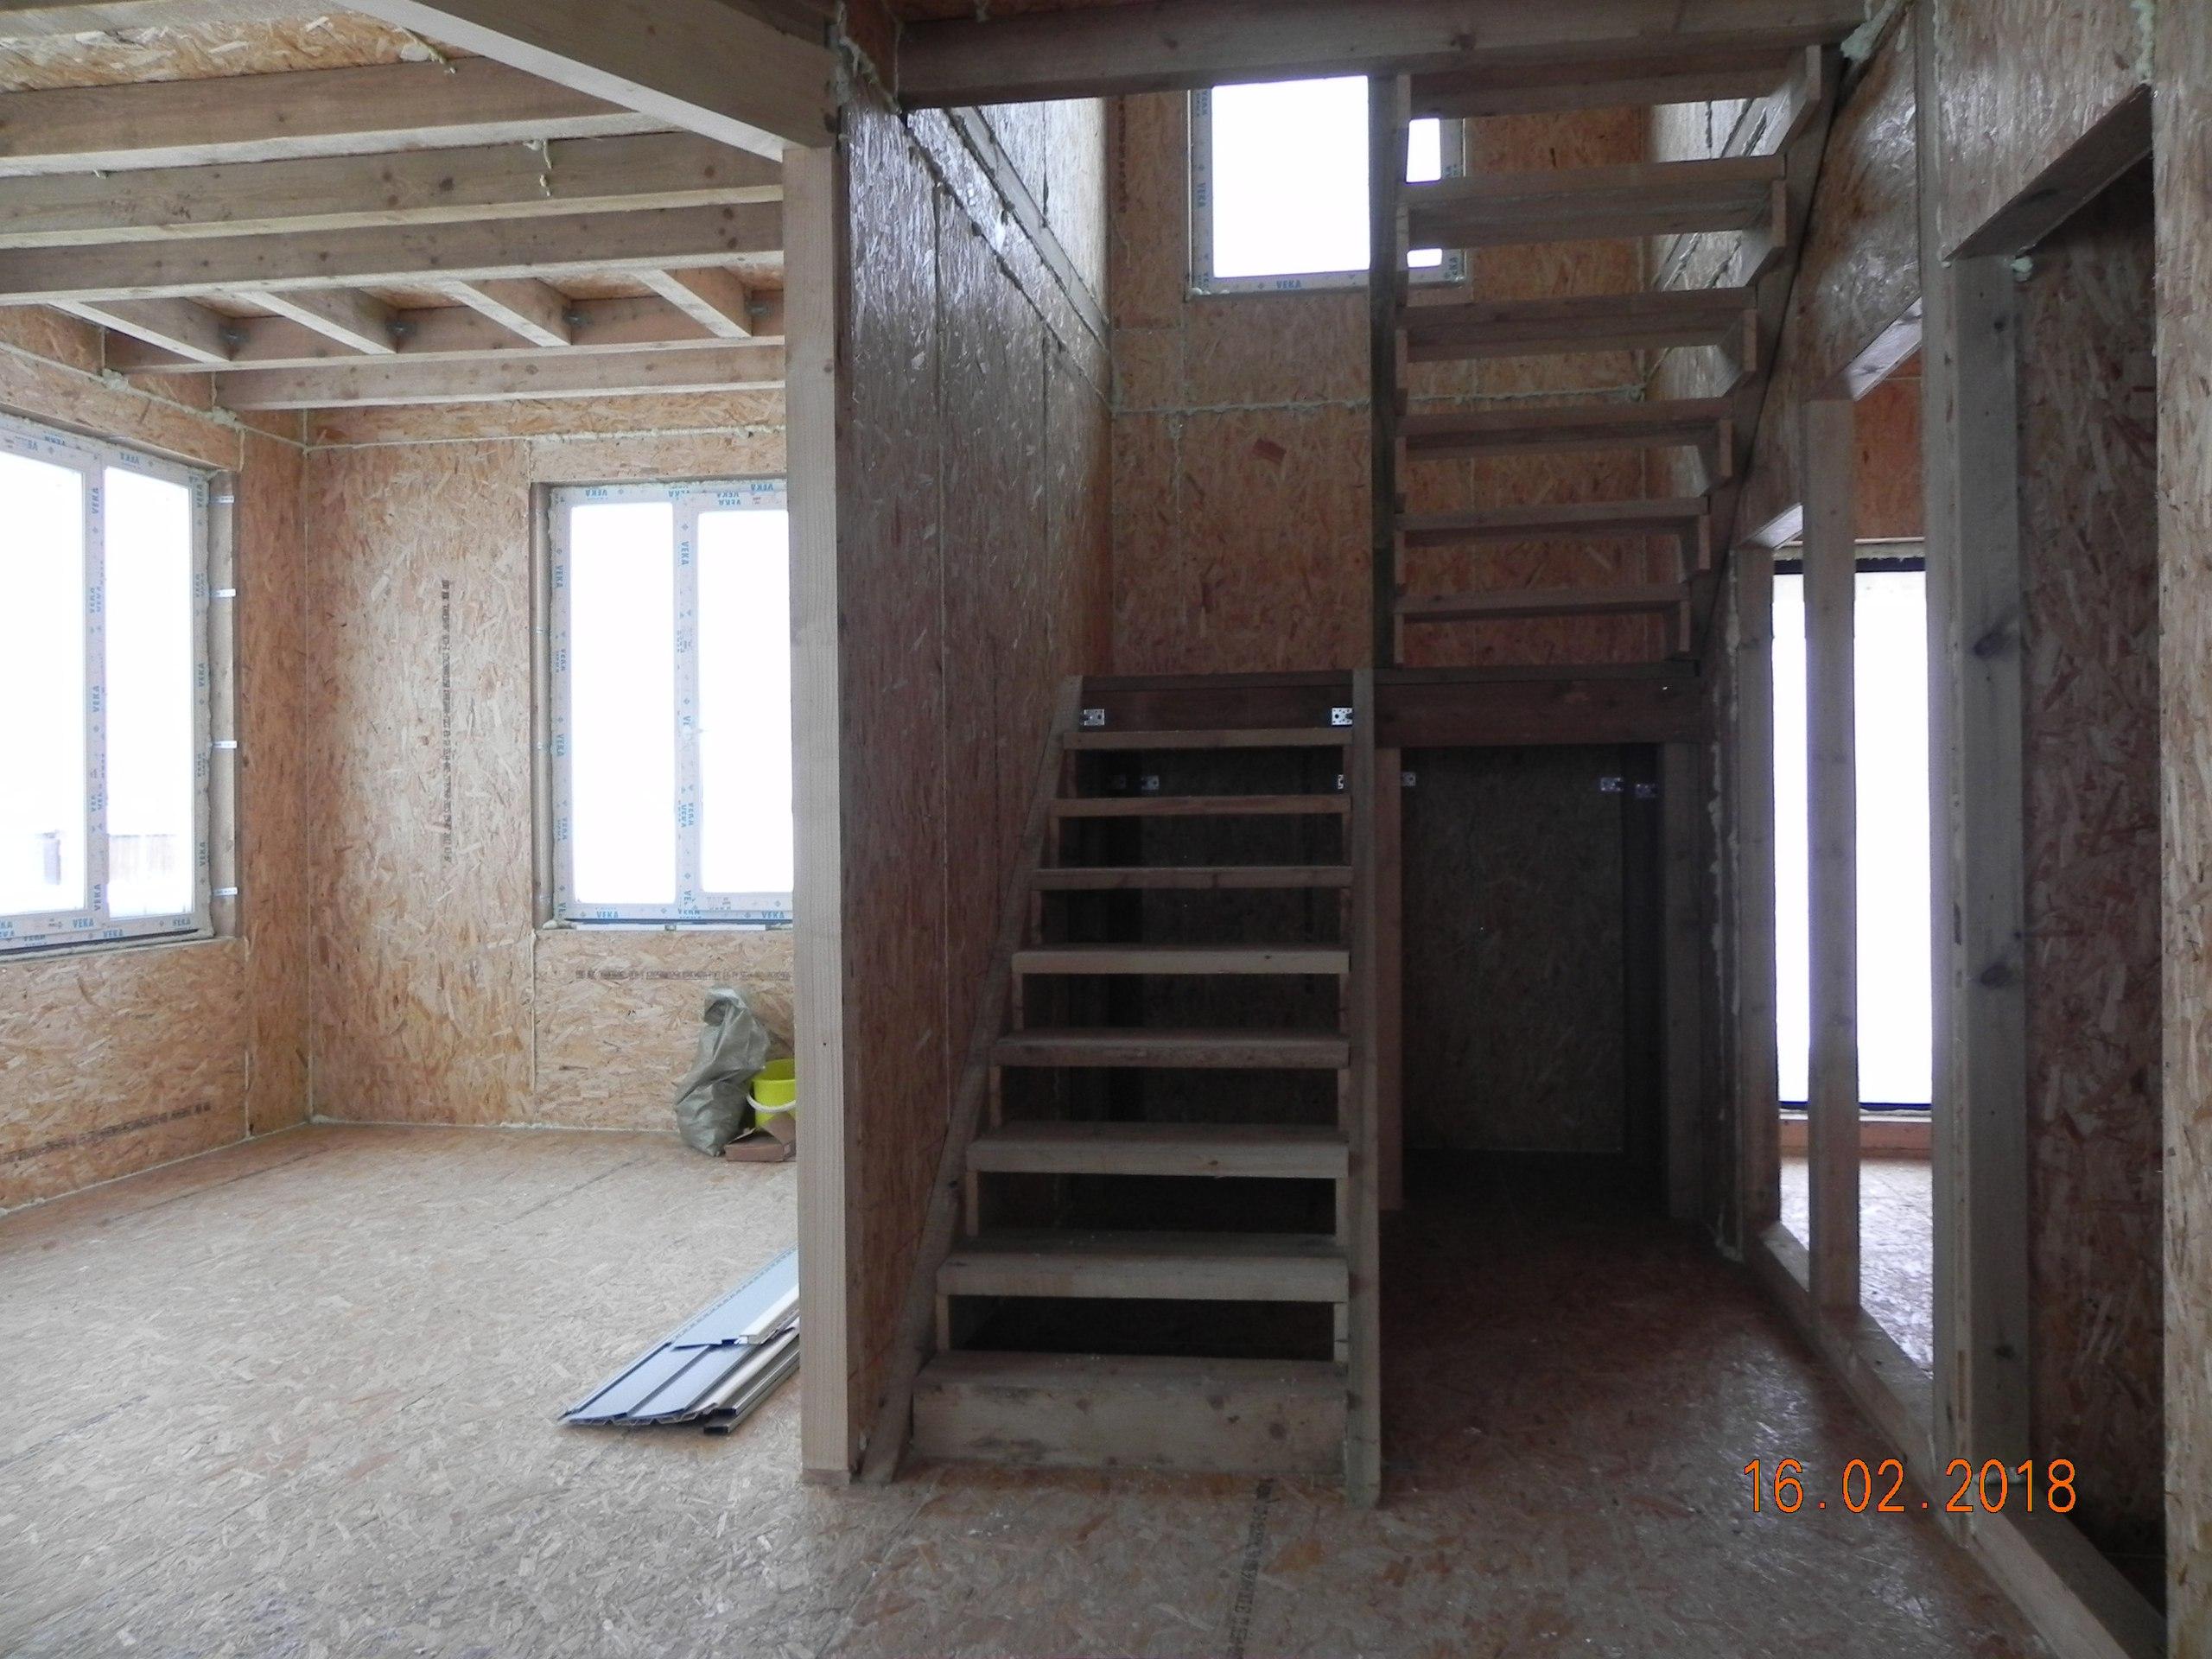 фото дома из сип панелей №7 сокули